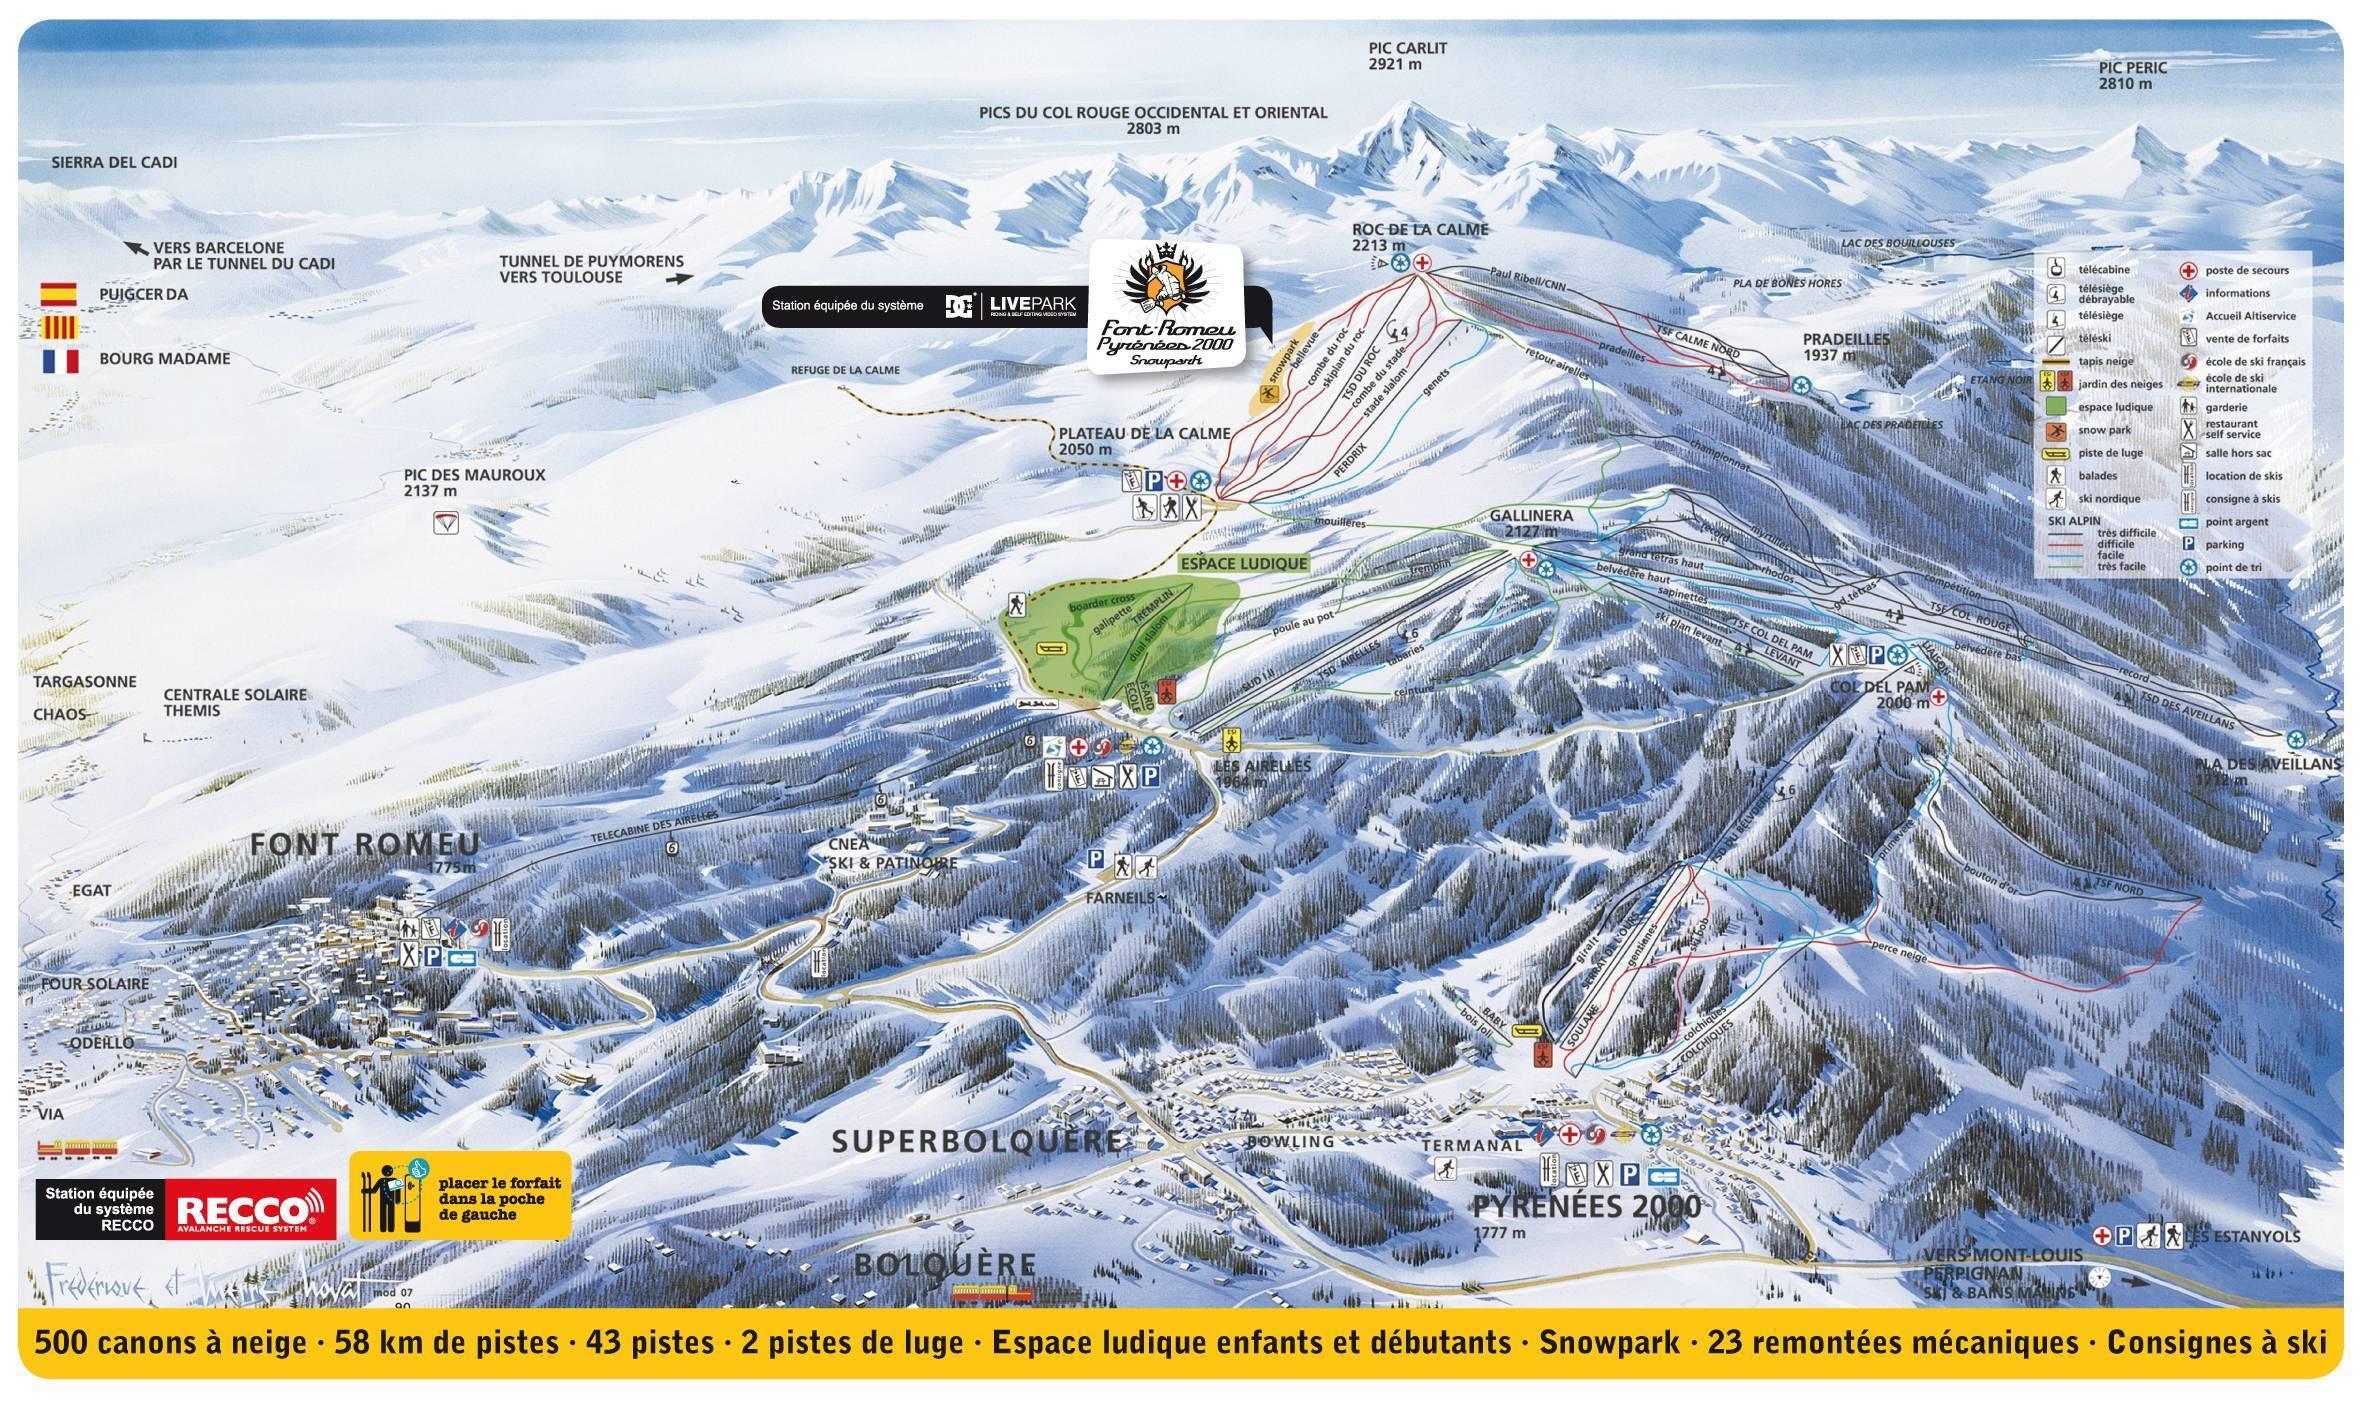 Font-Romeu / Bolquère Pyrénées 2000